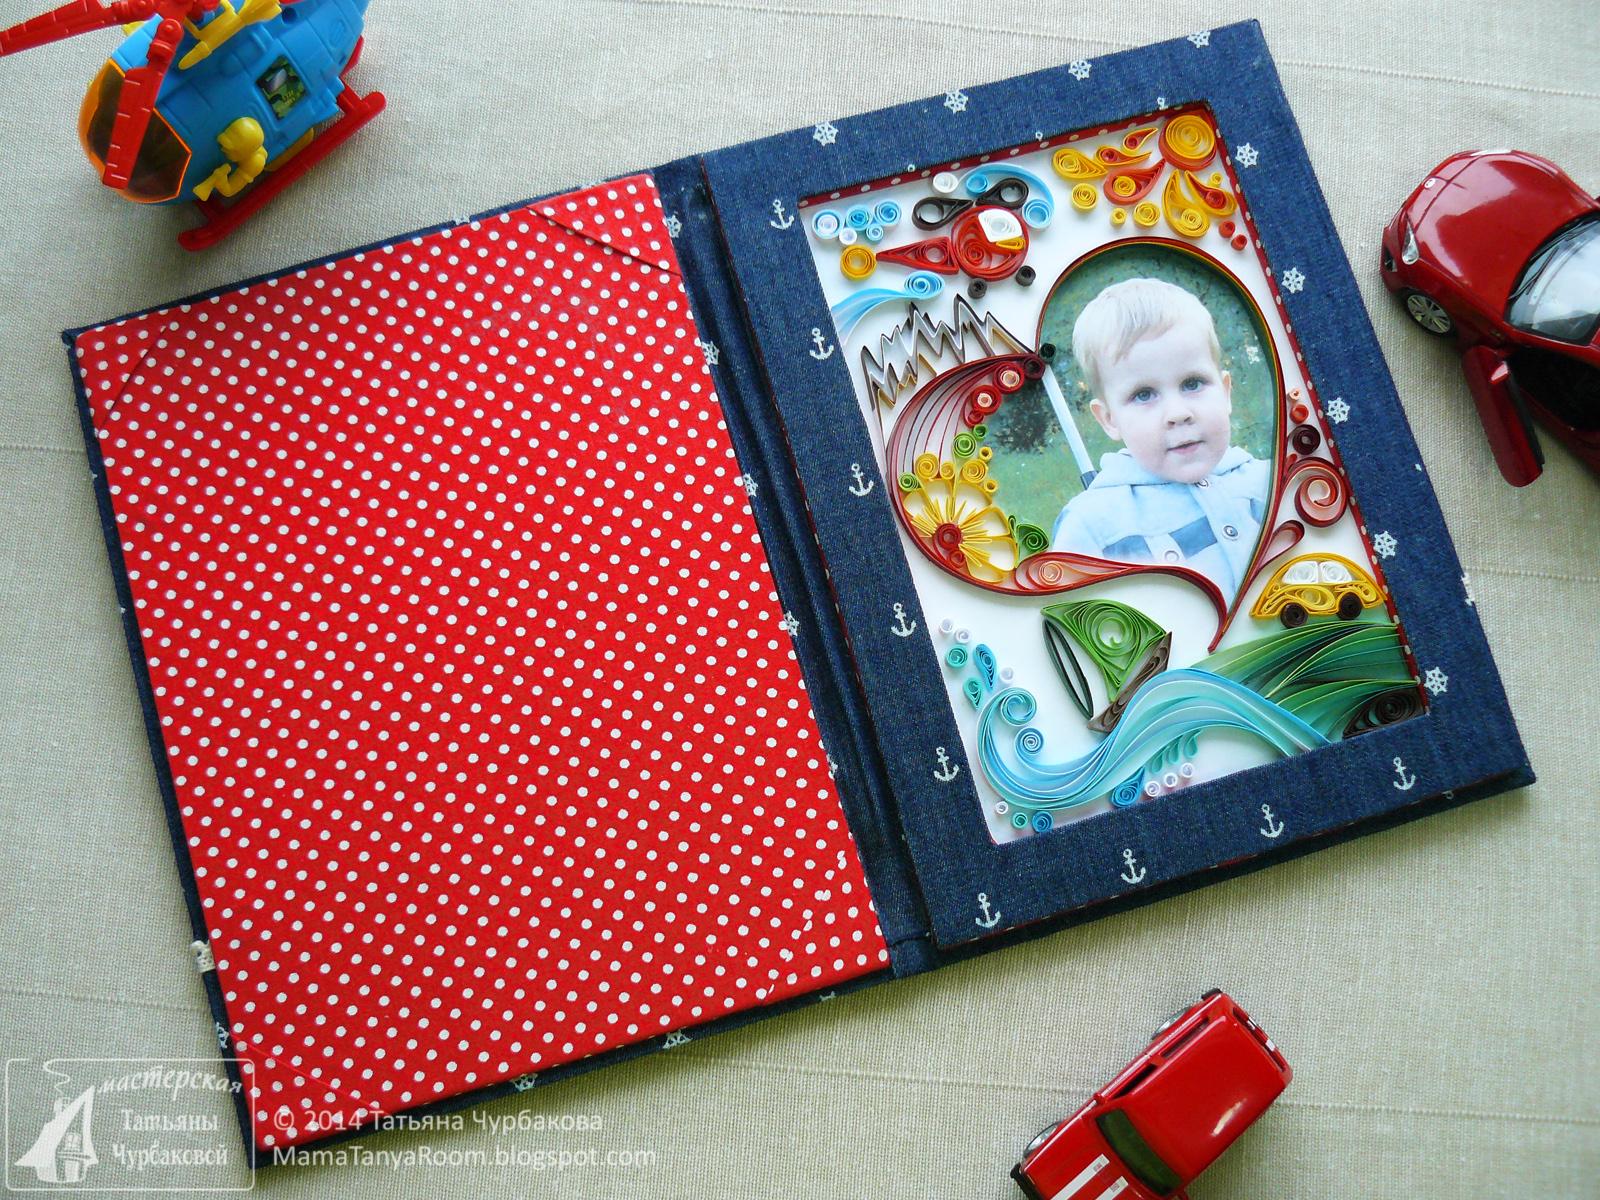 Фото-рамка квиллинг фото-рамка картонаж